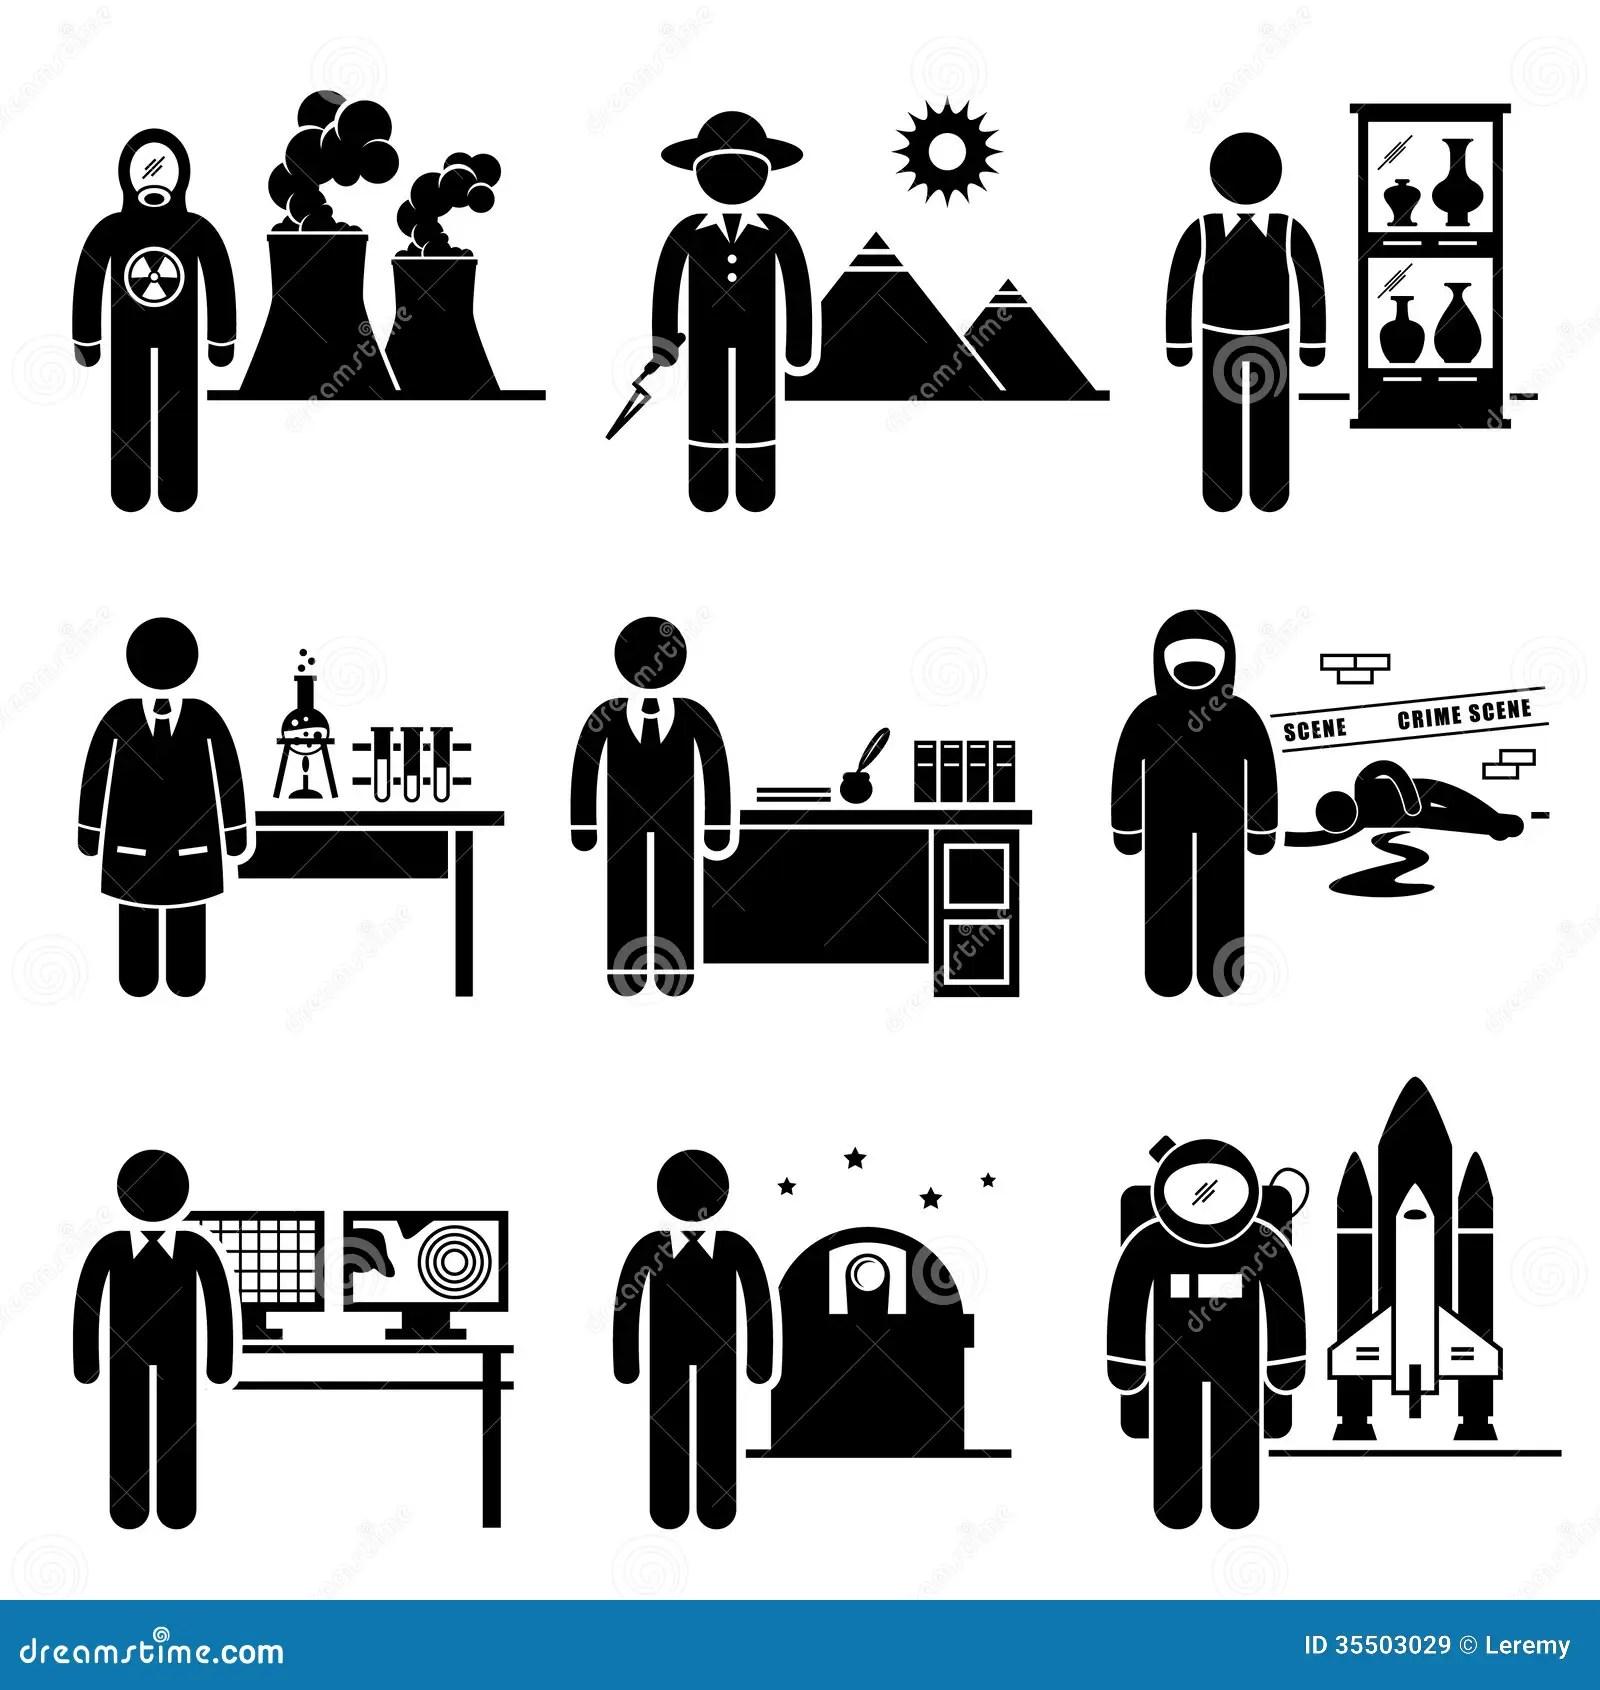 Professeur Jobs Occupations Careers De Scientifique